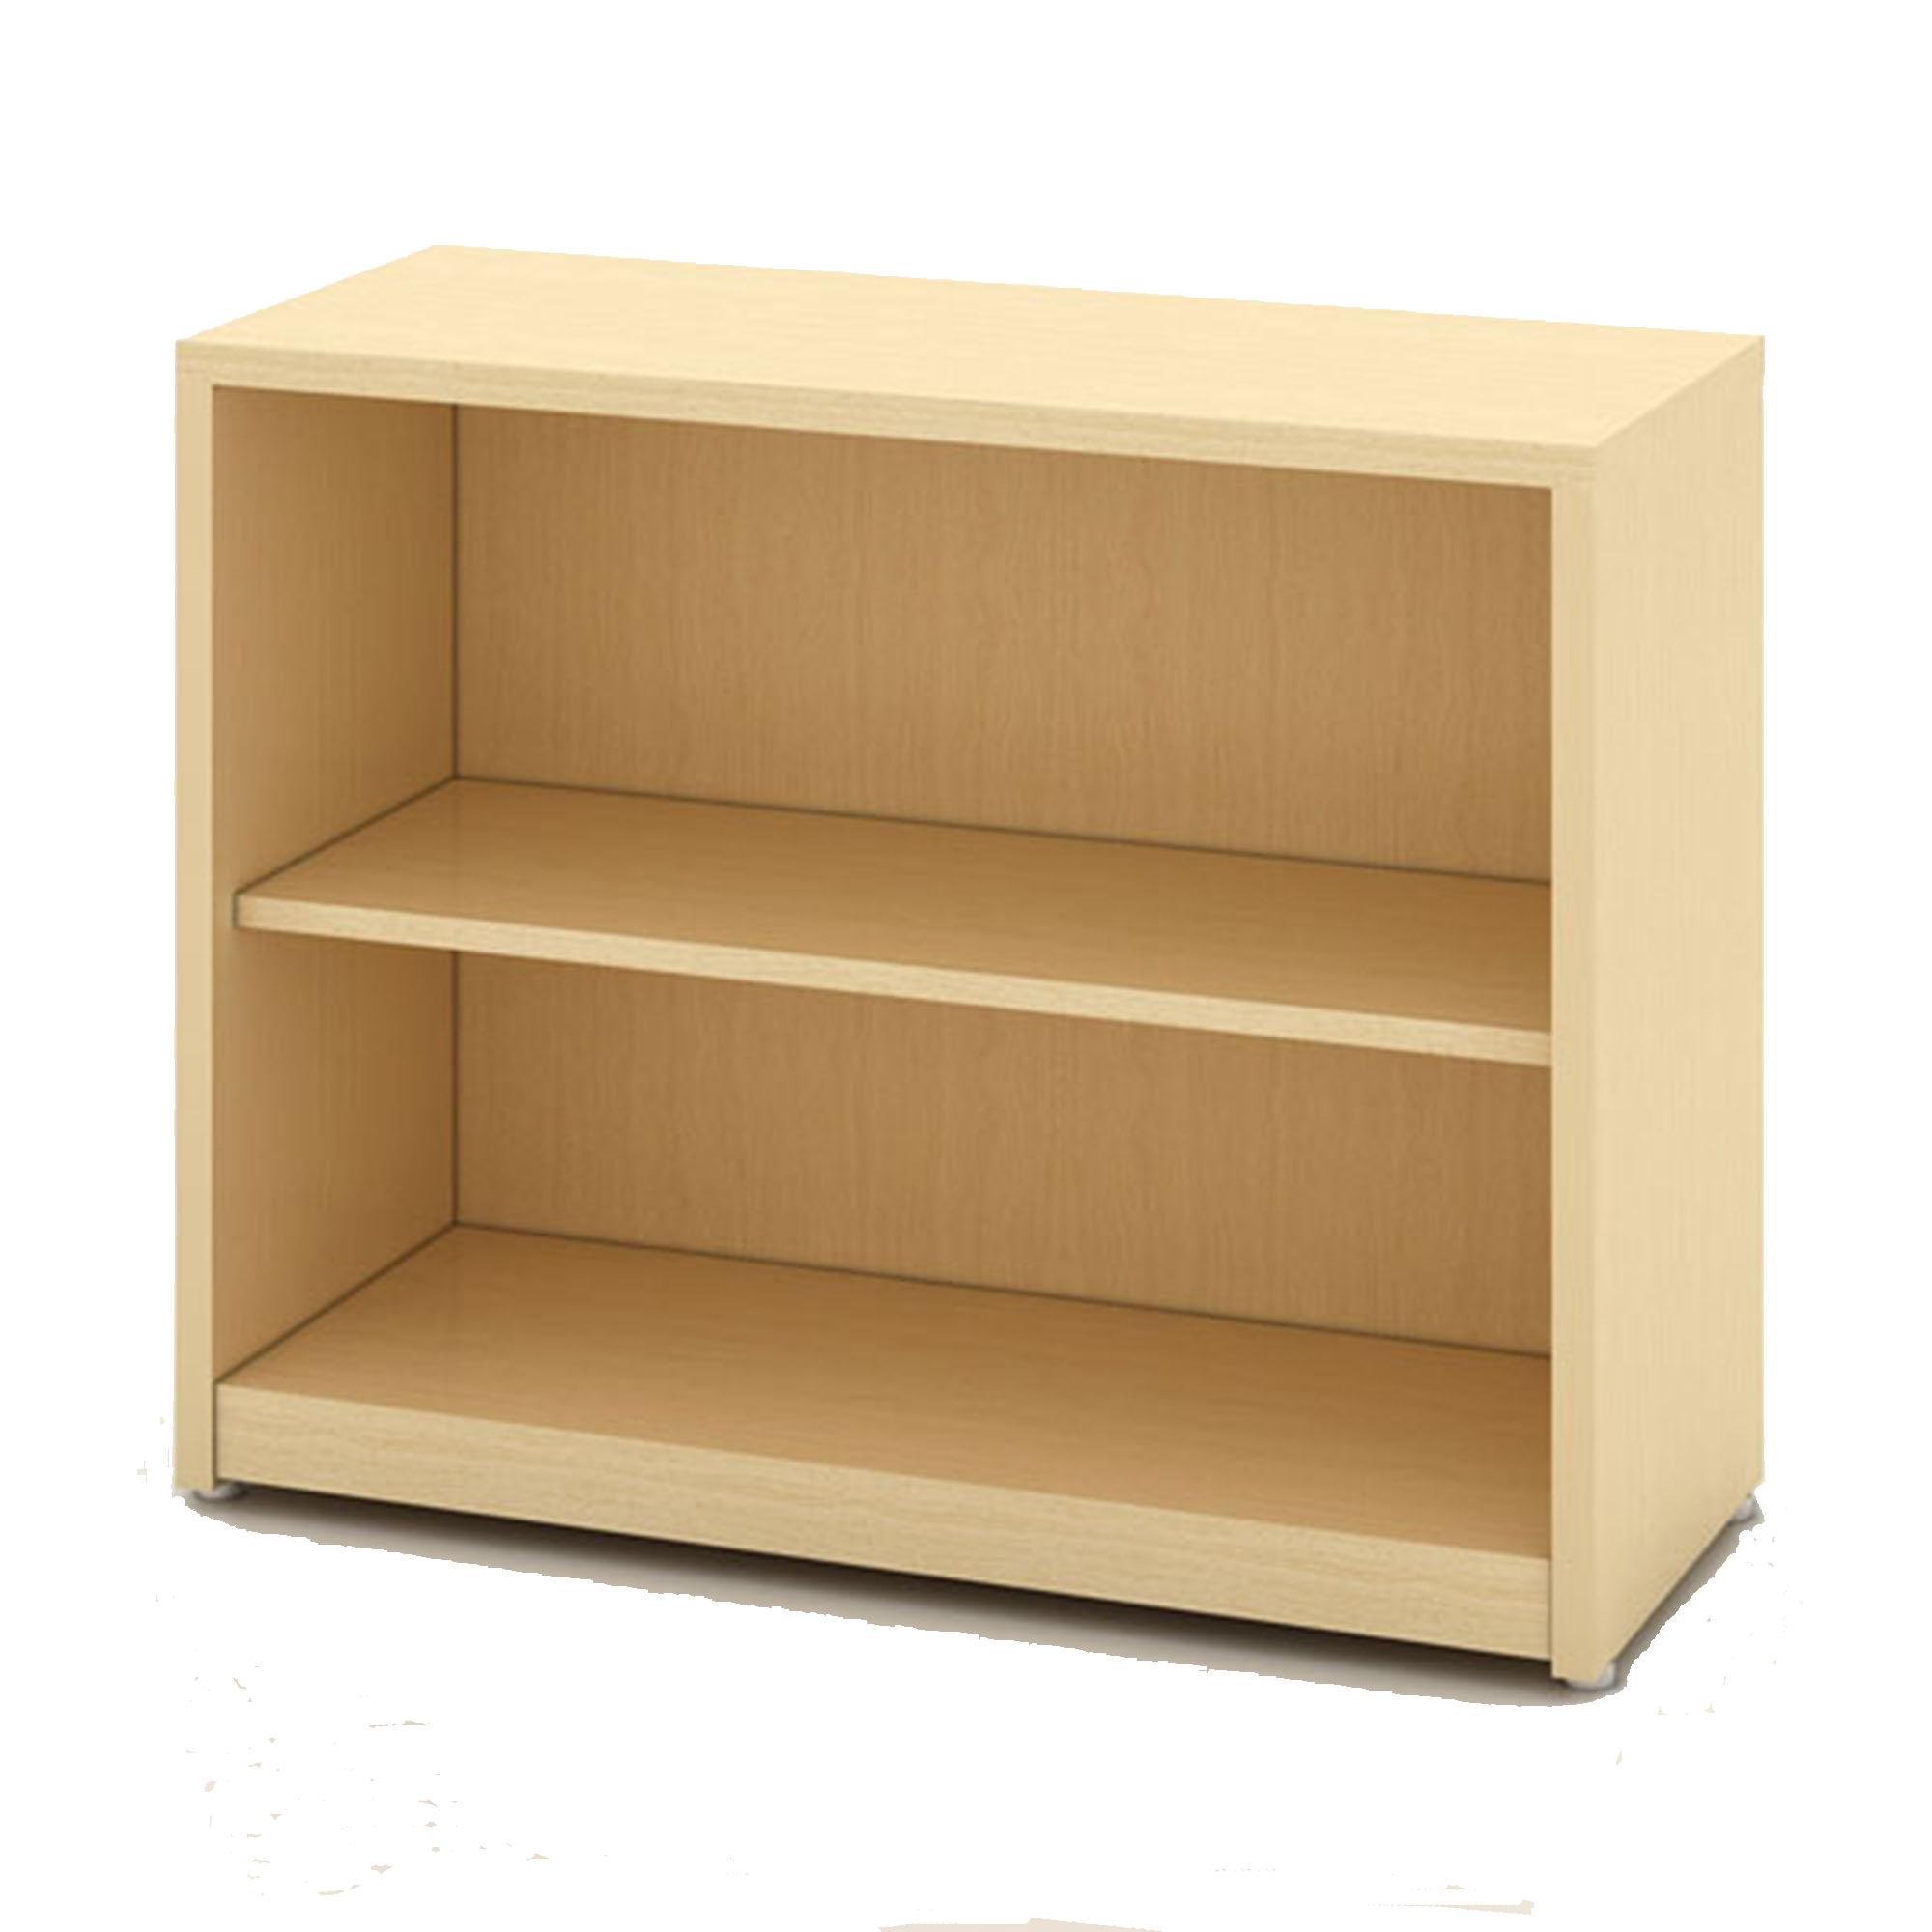 jpg free Empty related keywords bookcase. Bookshelf vector background